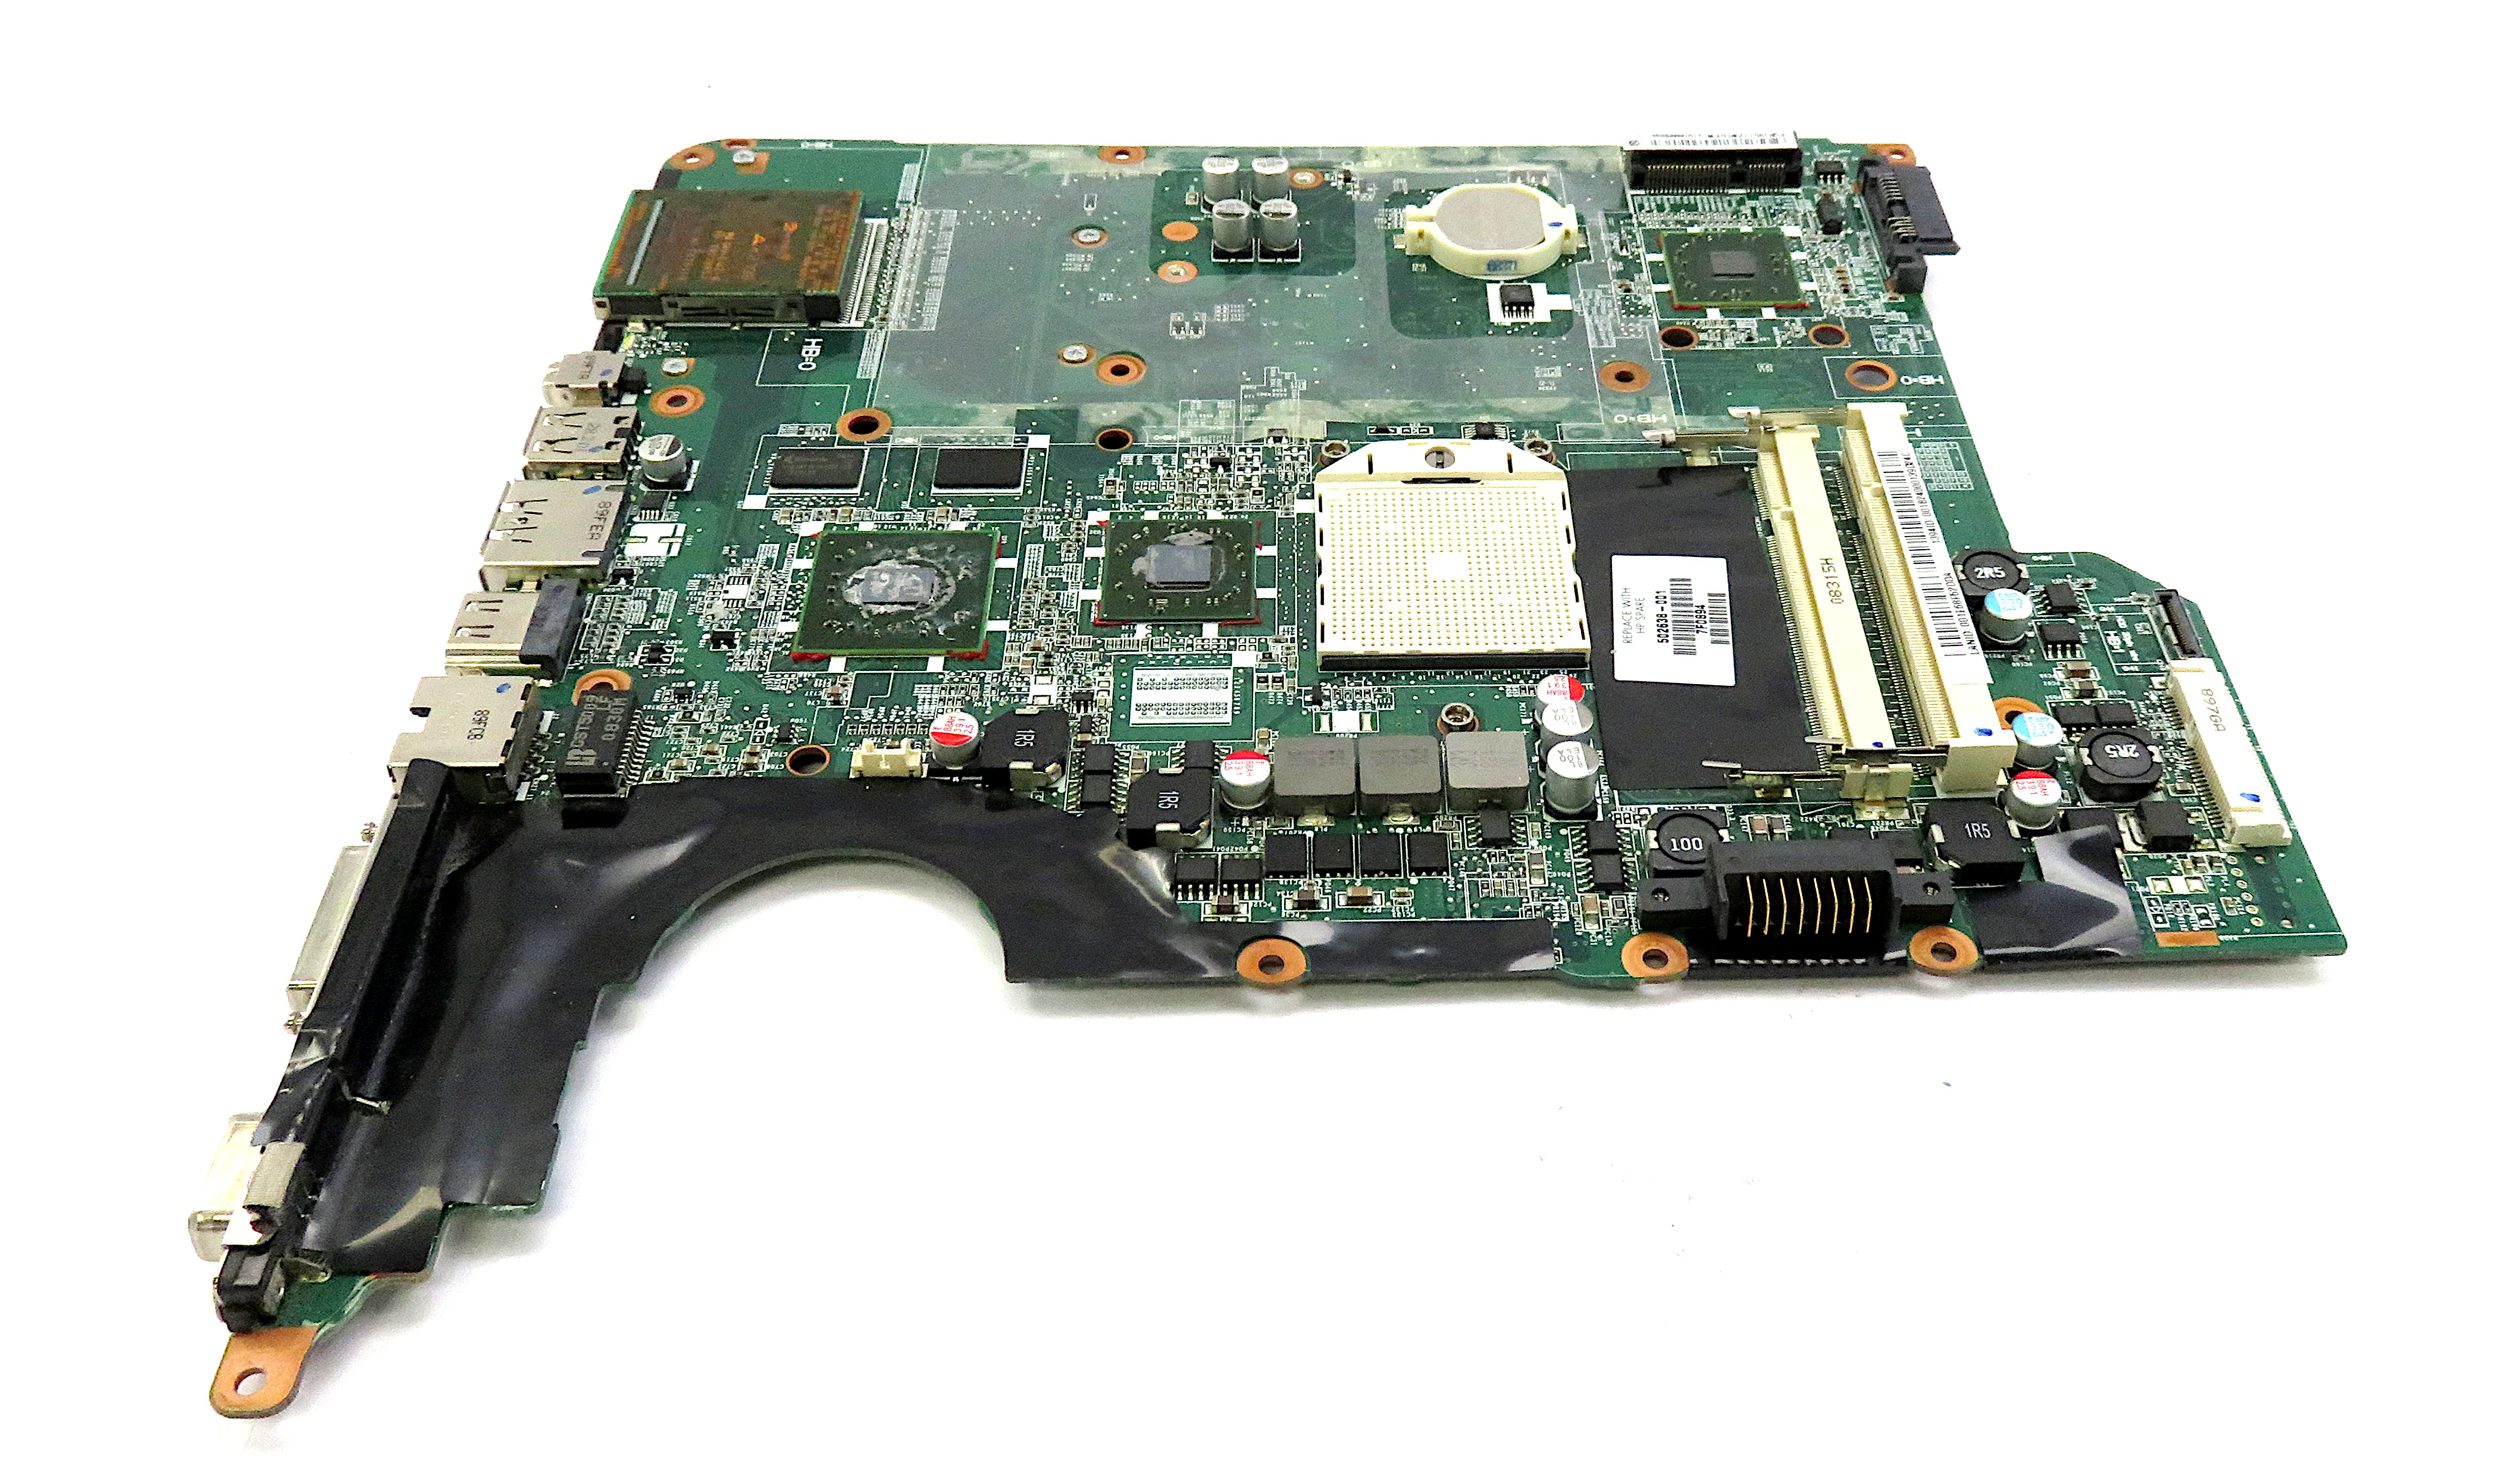 HP Pavilion DV5-1000 502638-001 Laptop Motherboard w/ S1 Socket